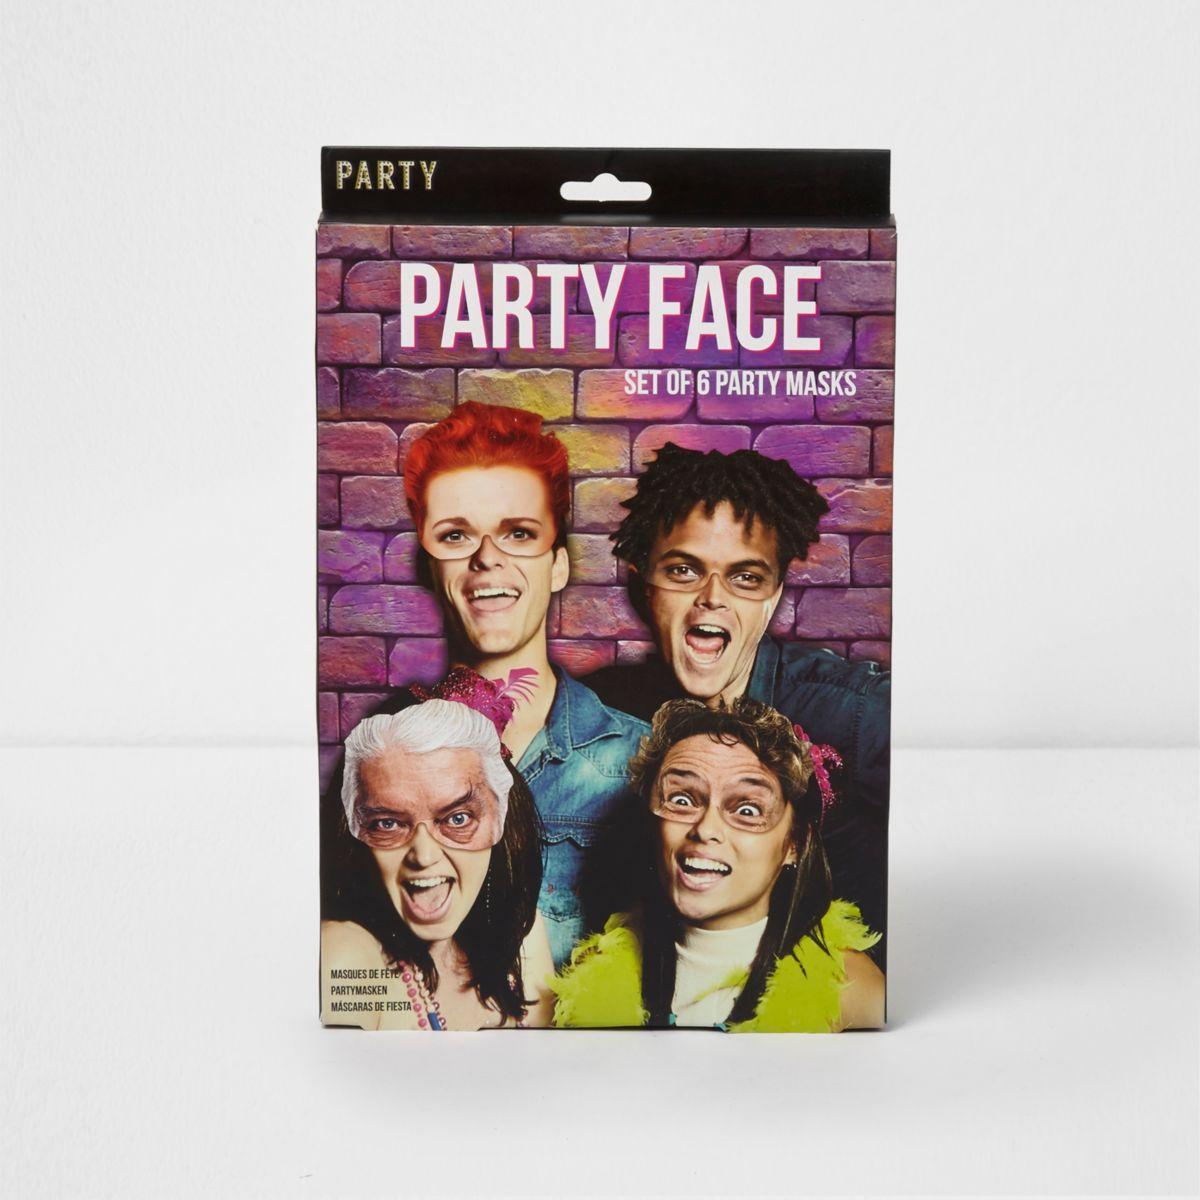 Party face mask set